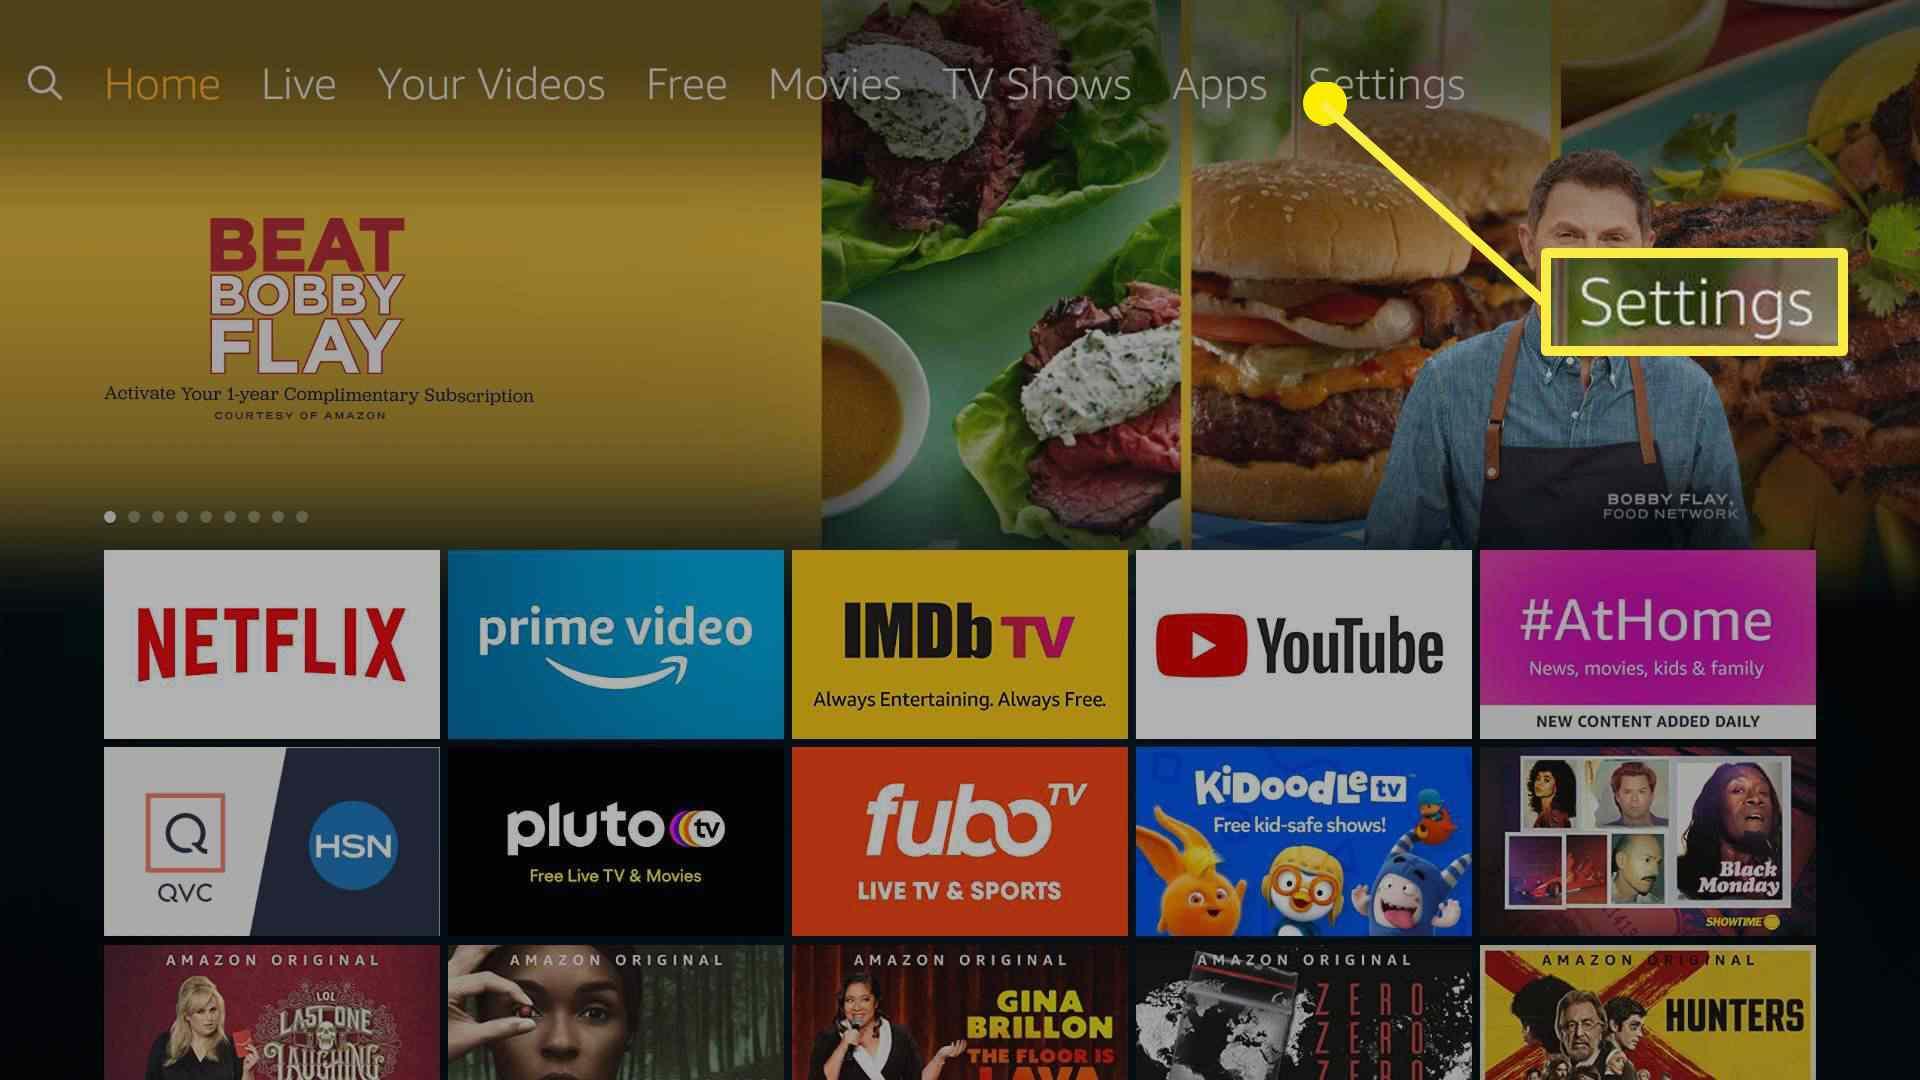 The Settings option on Amazon Fire TV Stick.